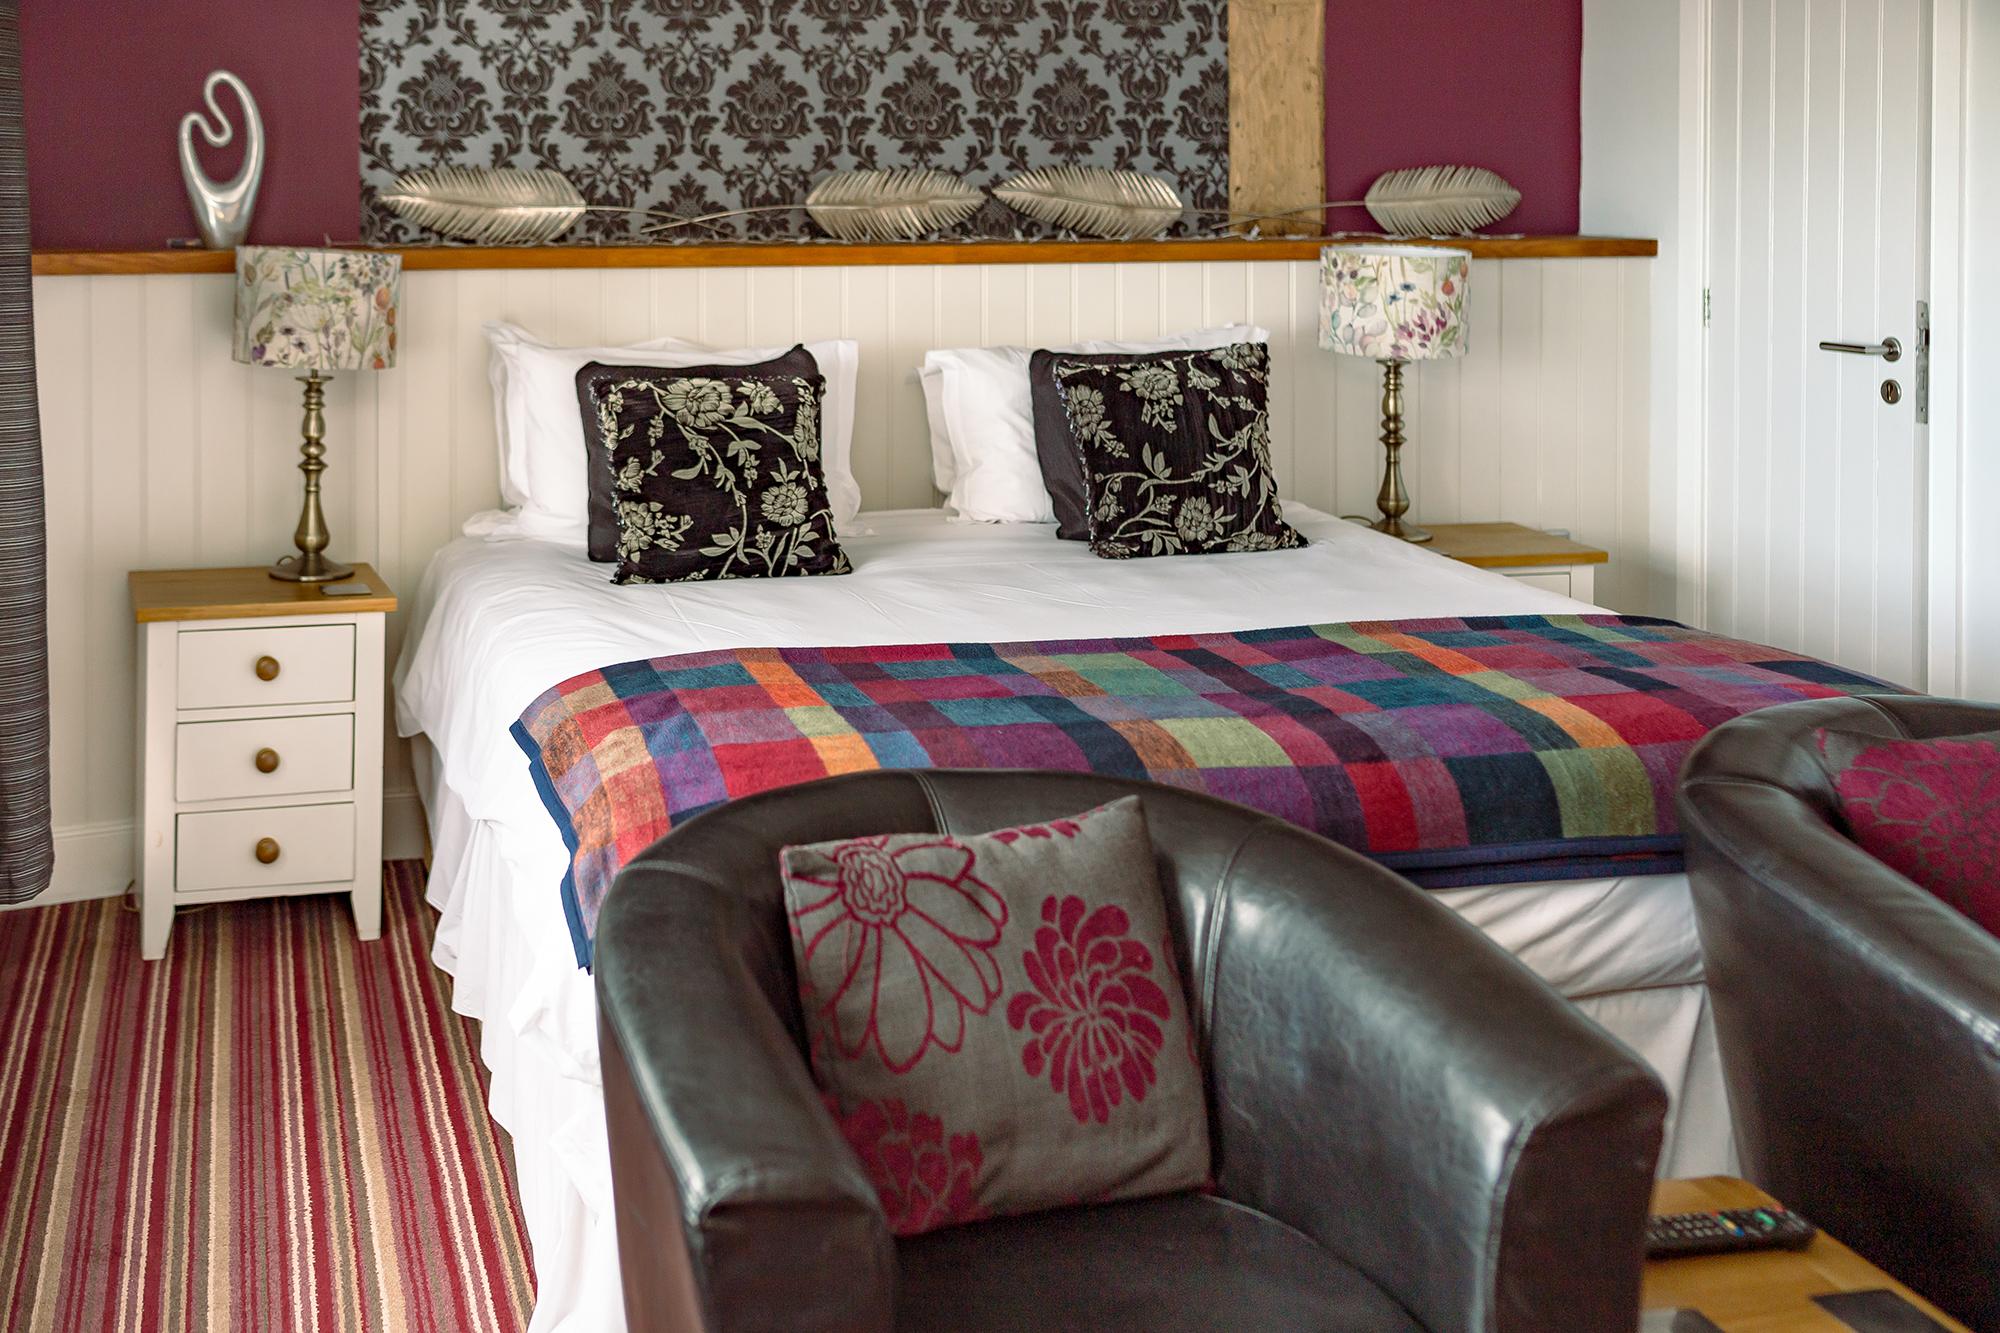 Closeup of bed